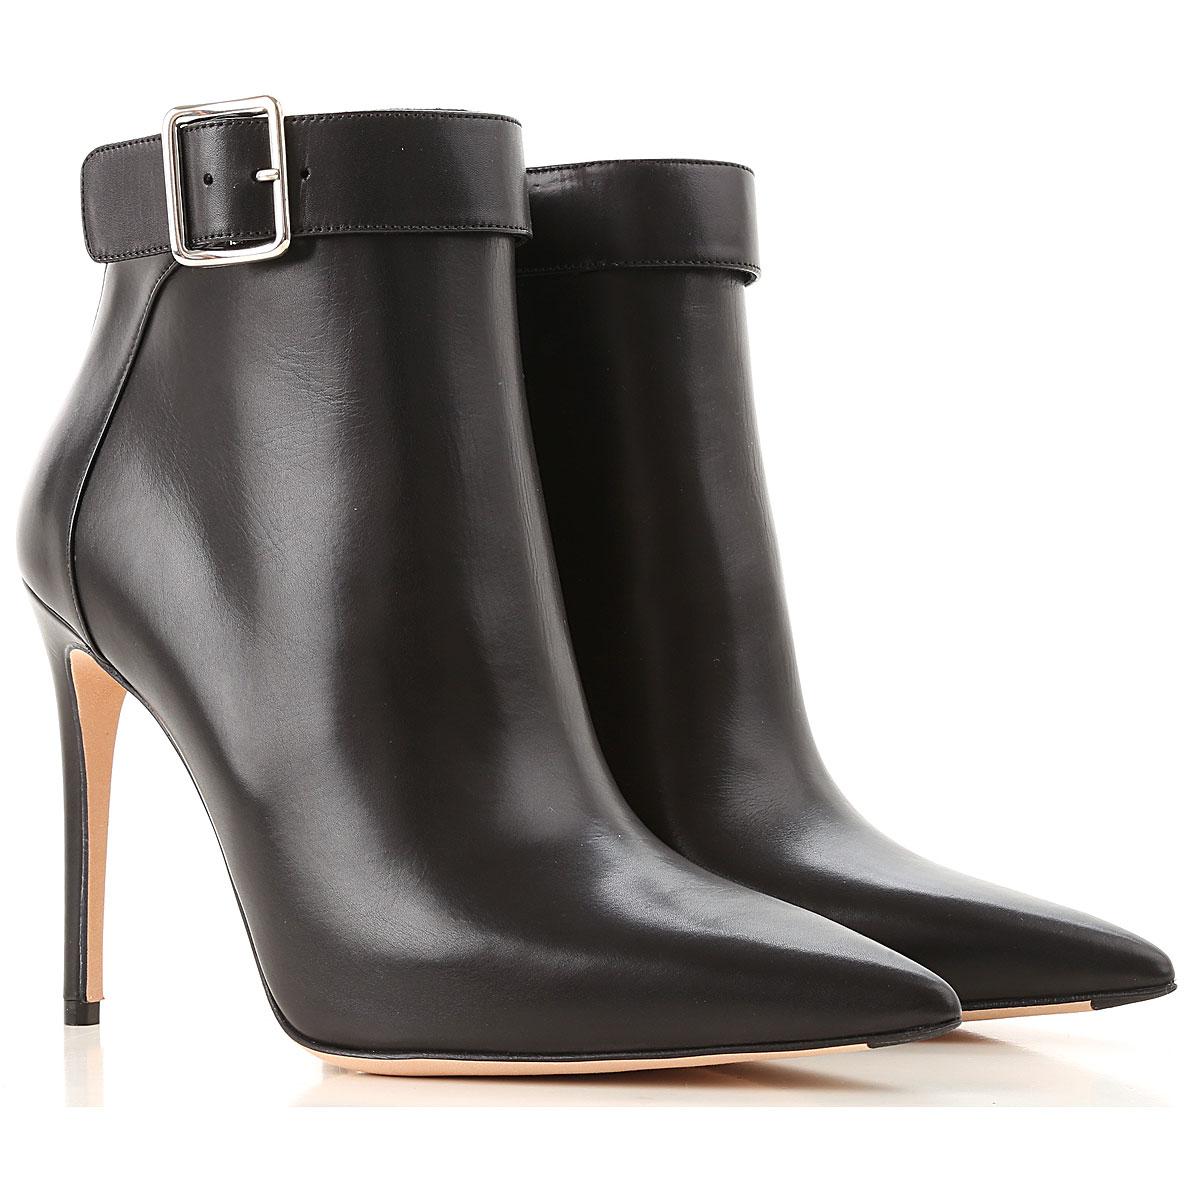 Image of Alexander McQueen Boots for Women, Booties, Black, Leather, 2017, 6 7 8 8.5